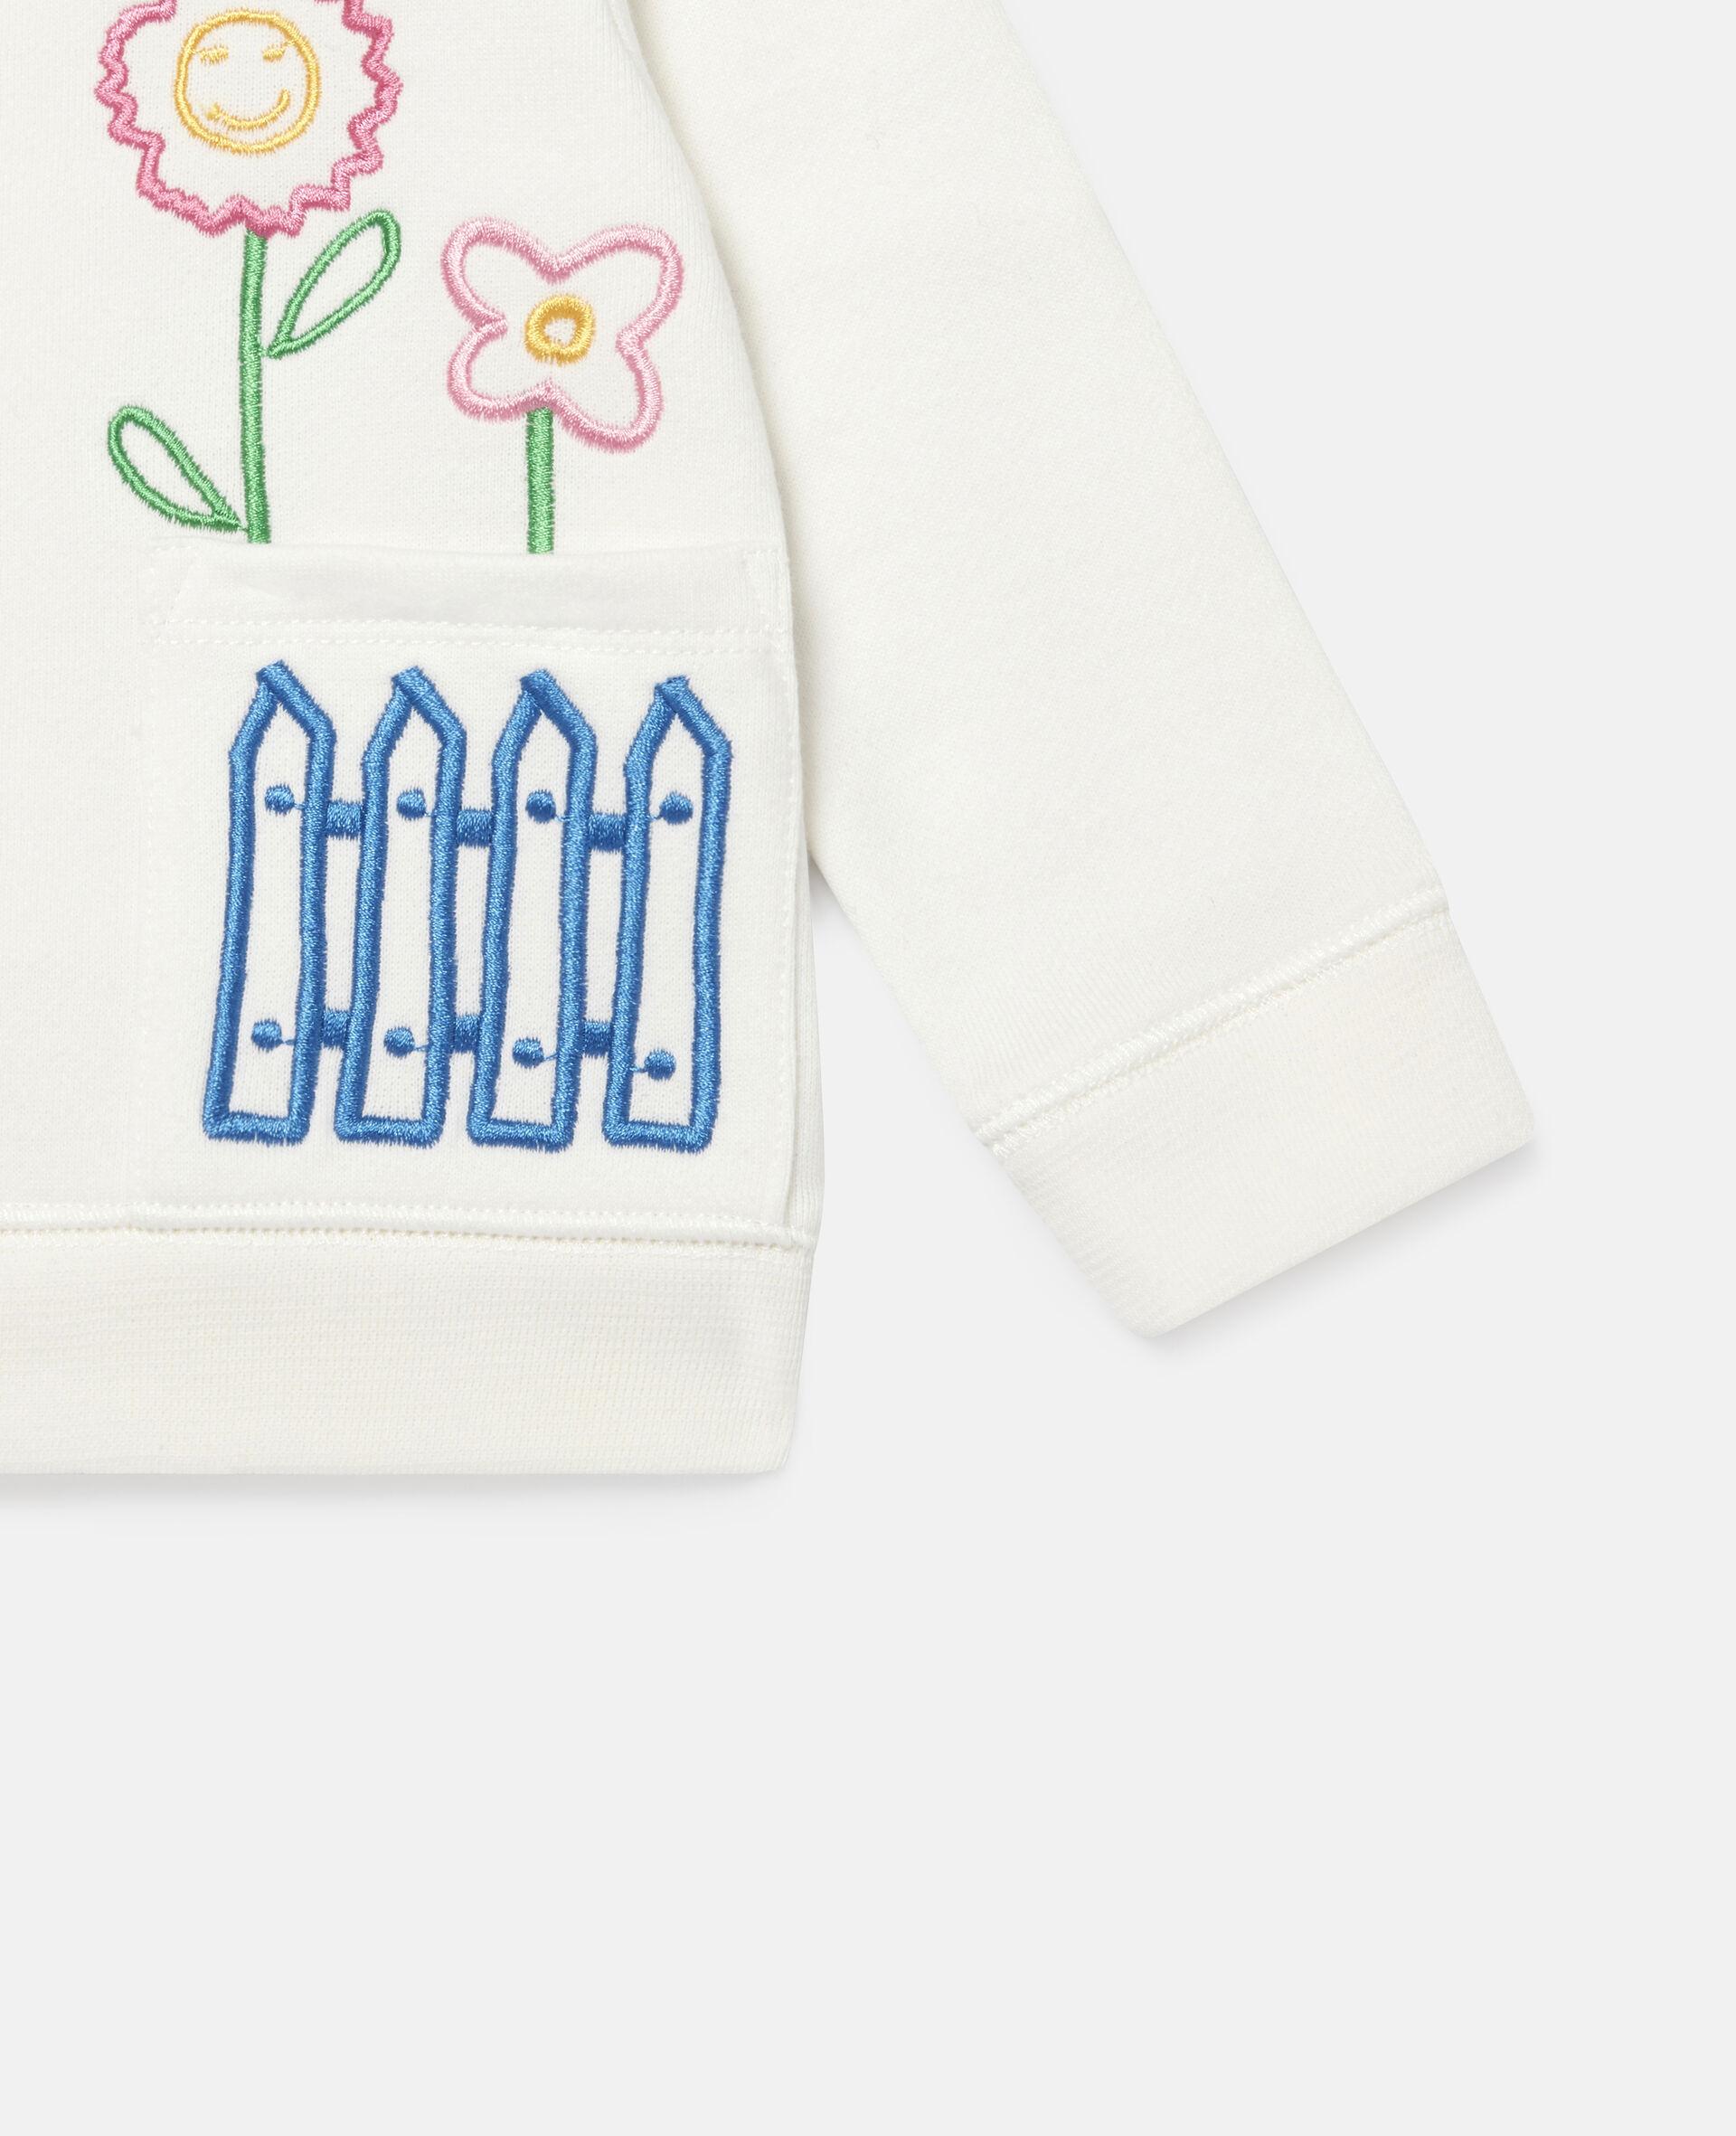 Embroidered Garden Fleece Sweatshirt-White-large image number 2